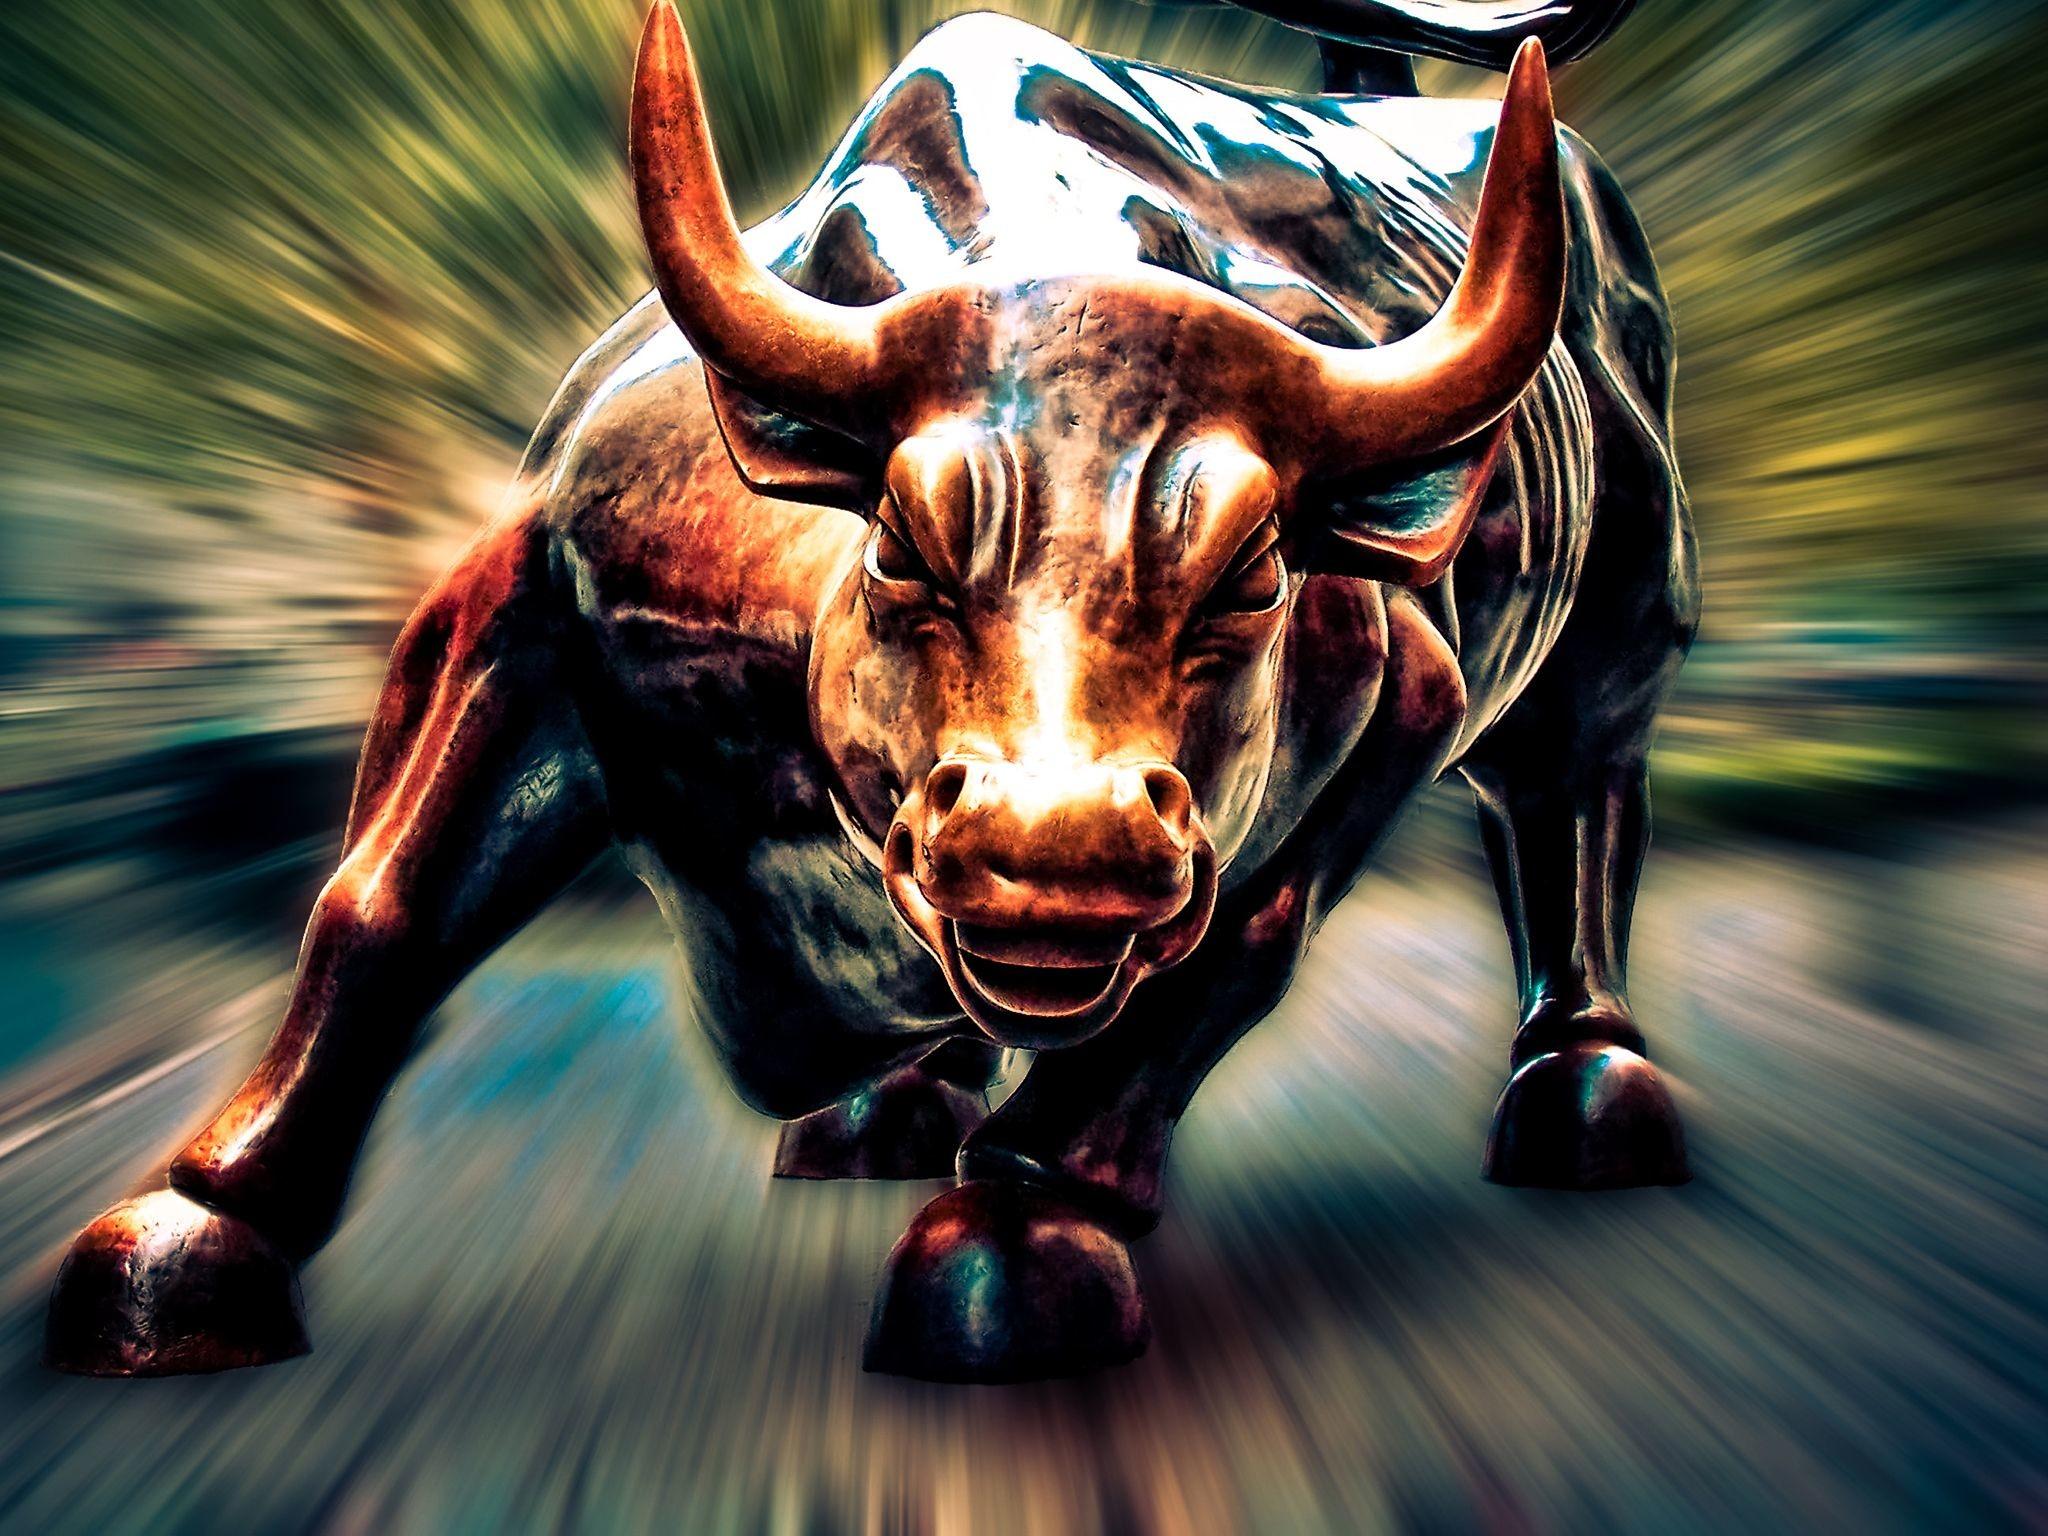 Wall Street Bull Wallpaper (61+ images)